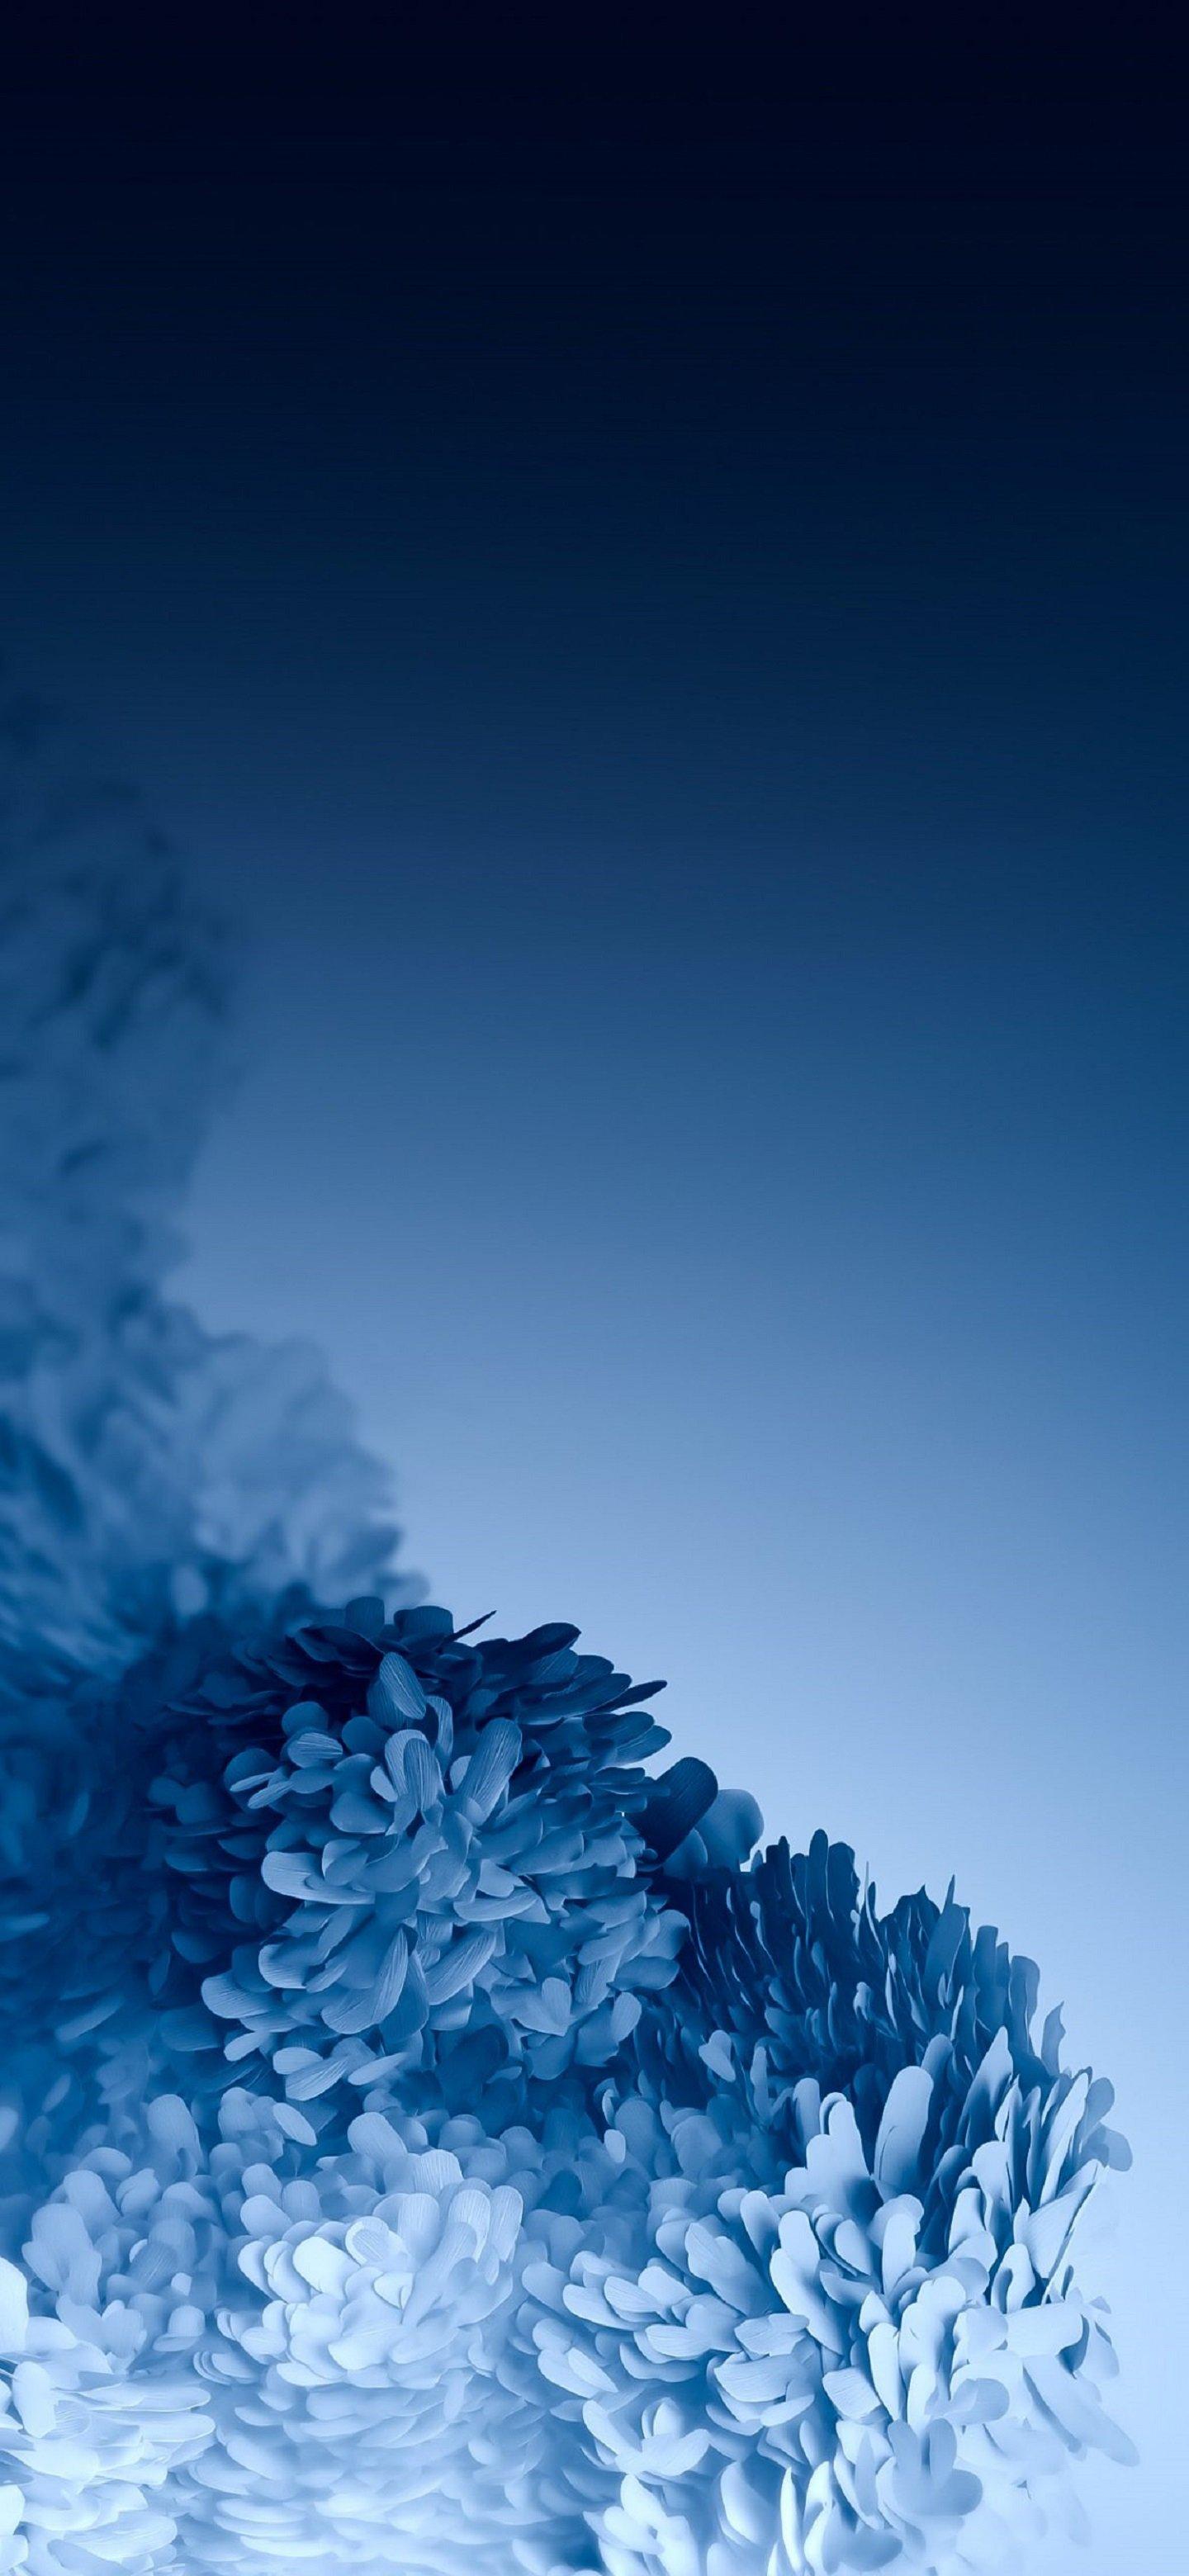 Samsung Galaxy S20 Wallpaper UseWallpaper 11 1440x3120 2190000065 1440x3120